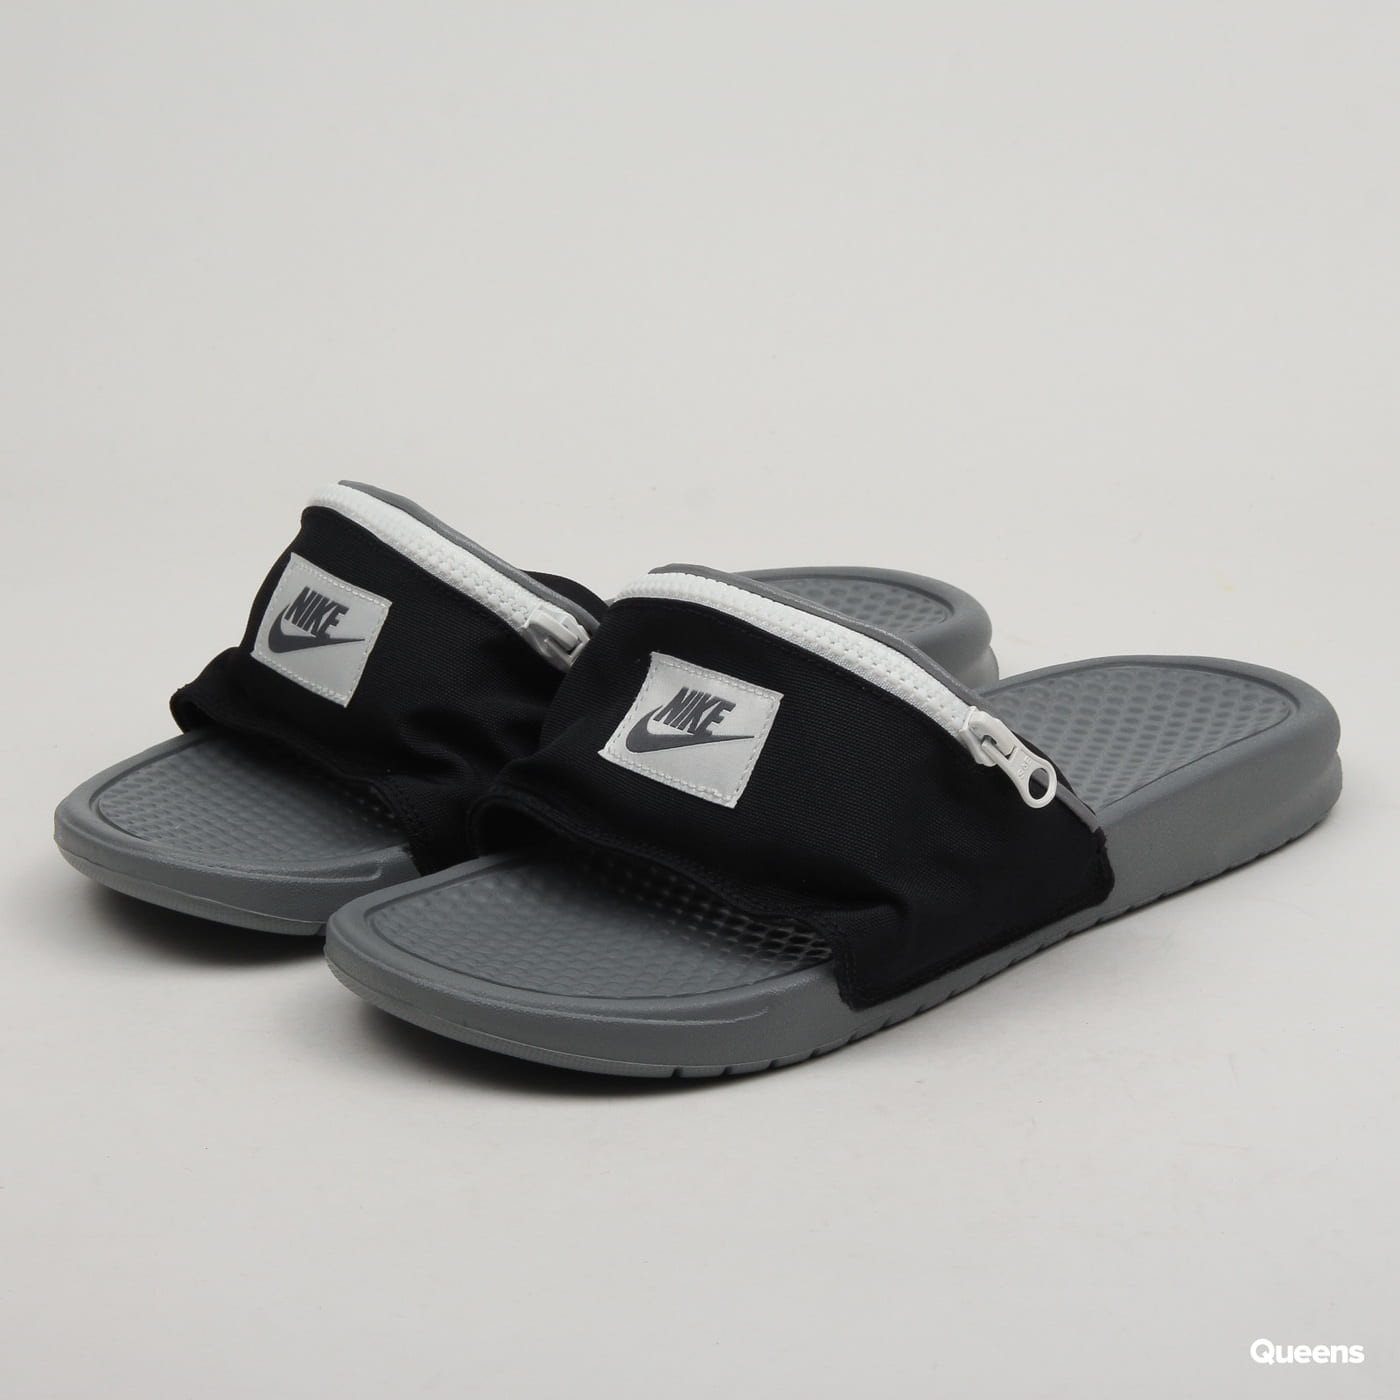 mejor lugar para reunirse mejores telas Slippers Nike Benassi JDI Fanny Pack black / cool grey - summit ...